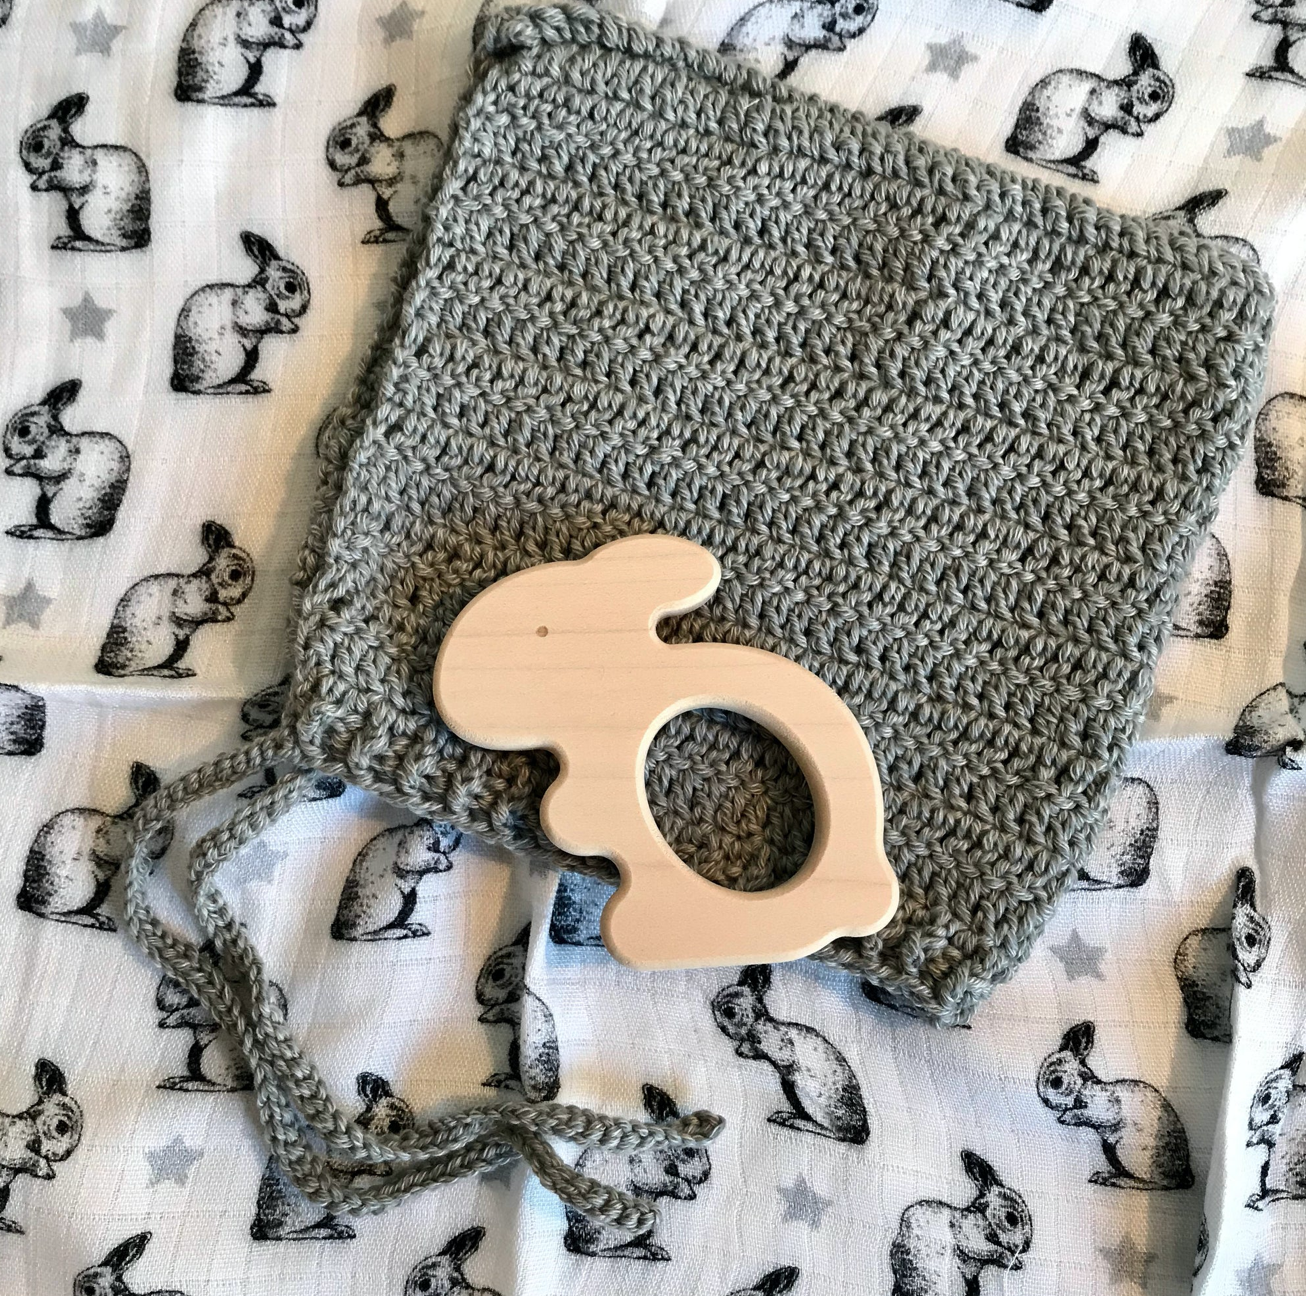 Swaddle Gift Set With Rabbit Teether